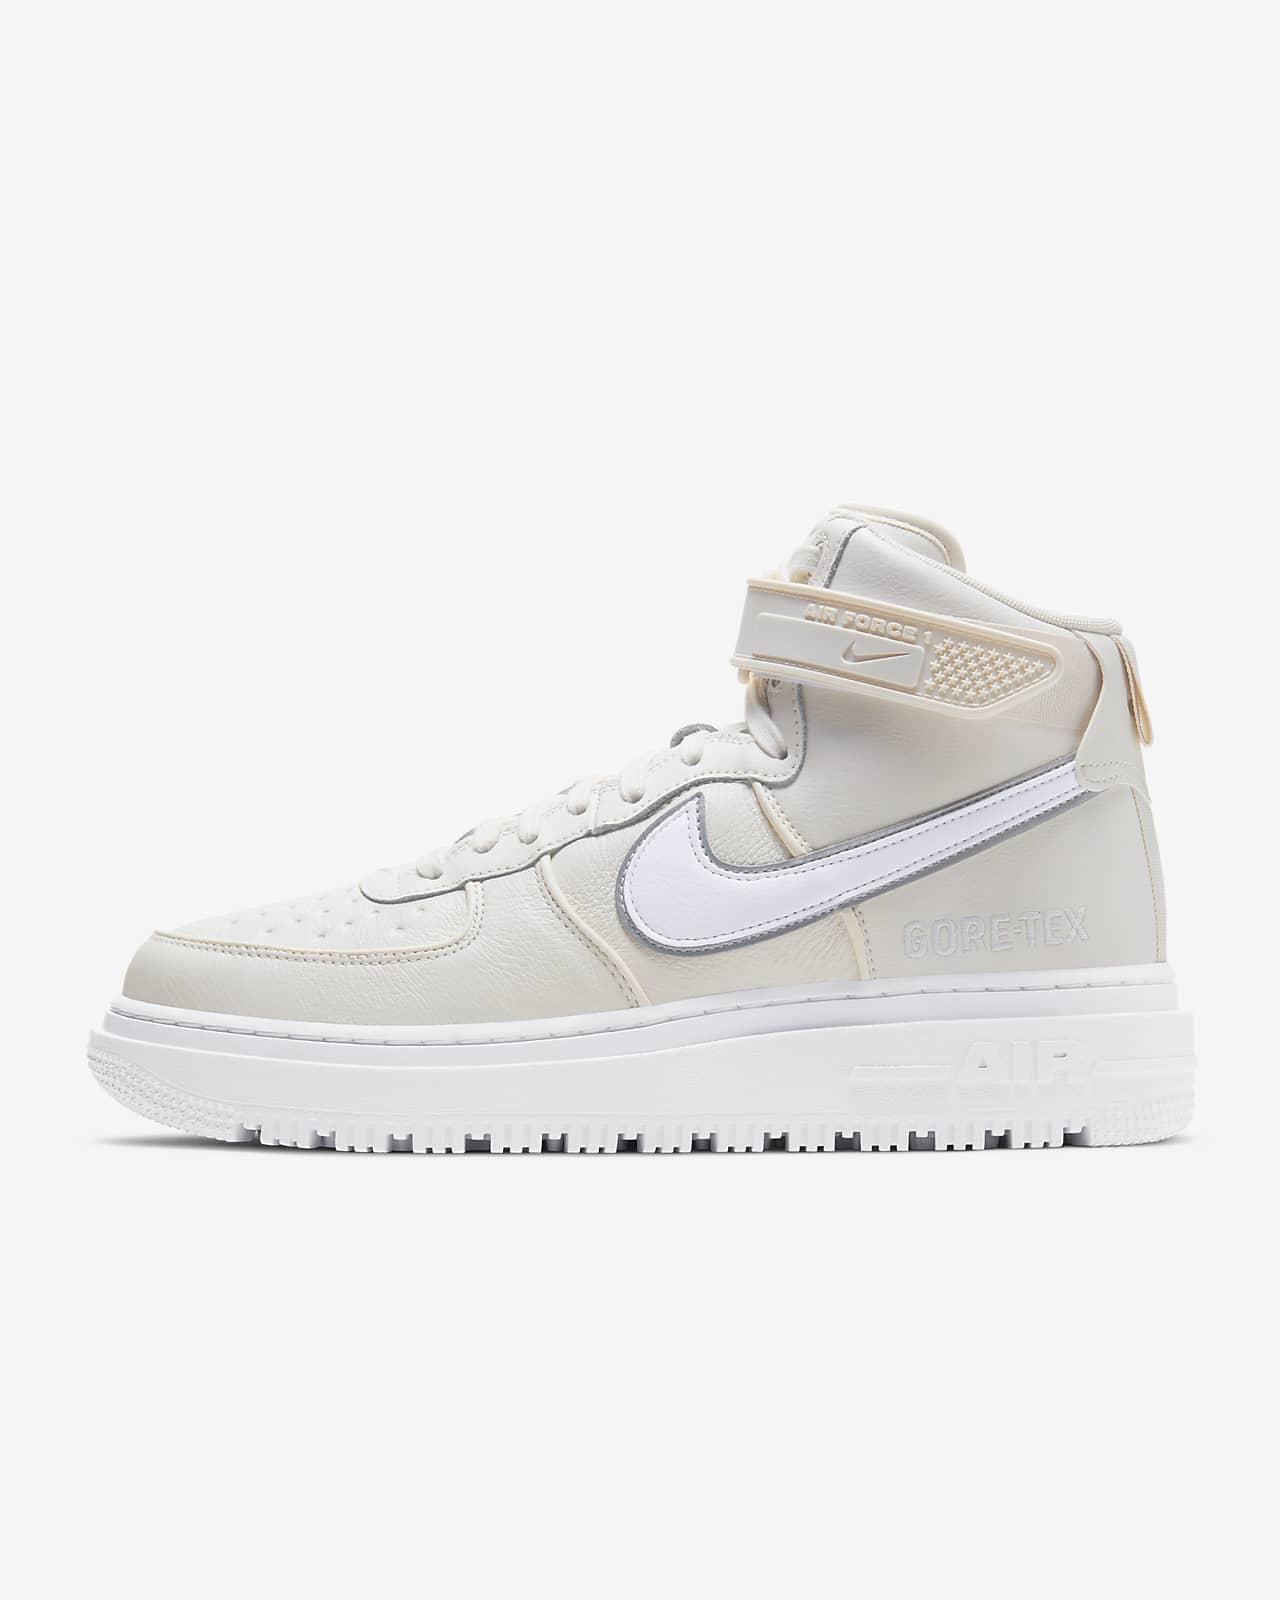 Nike Air Force 1 GORE-TEX Herren Stiefel